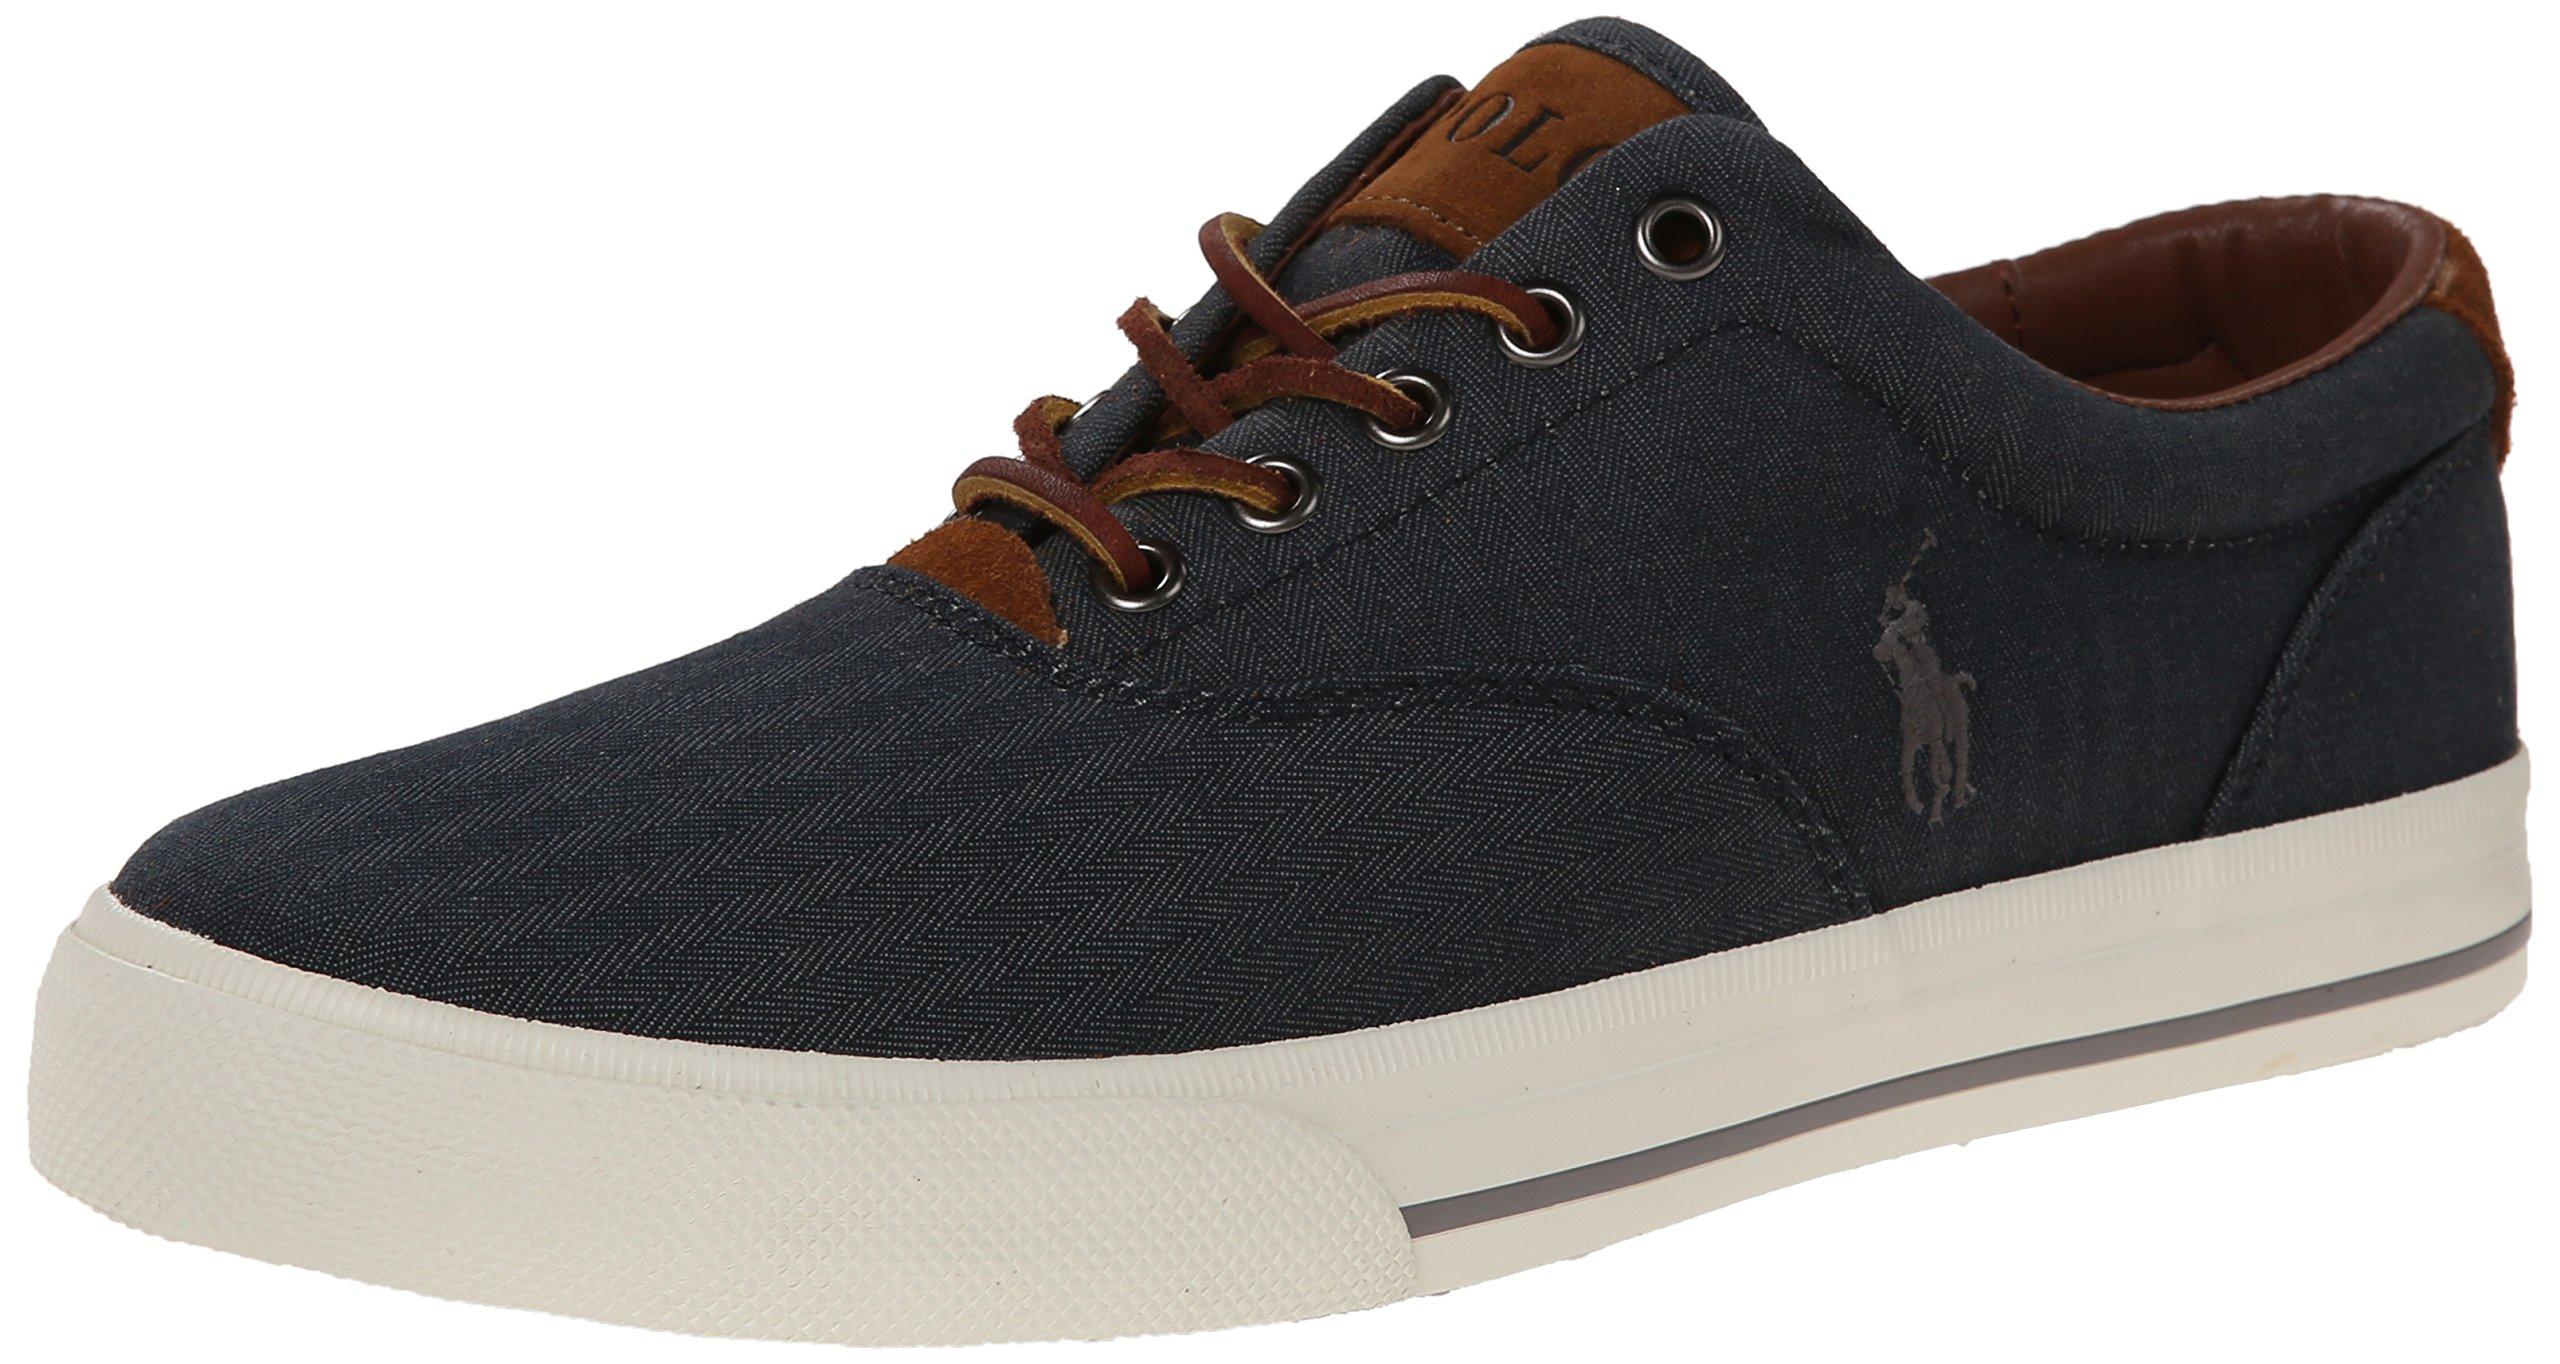 Polo Ralph Lauren Men's Vaughn Fashion Sneaker, Denim, 11 D US